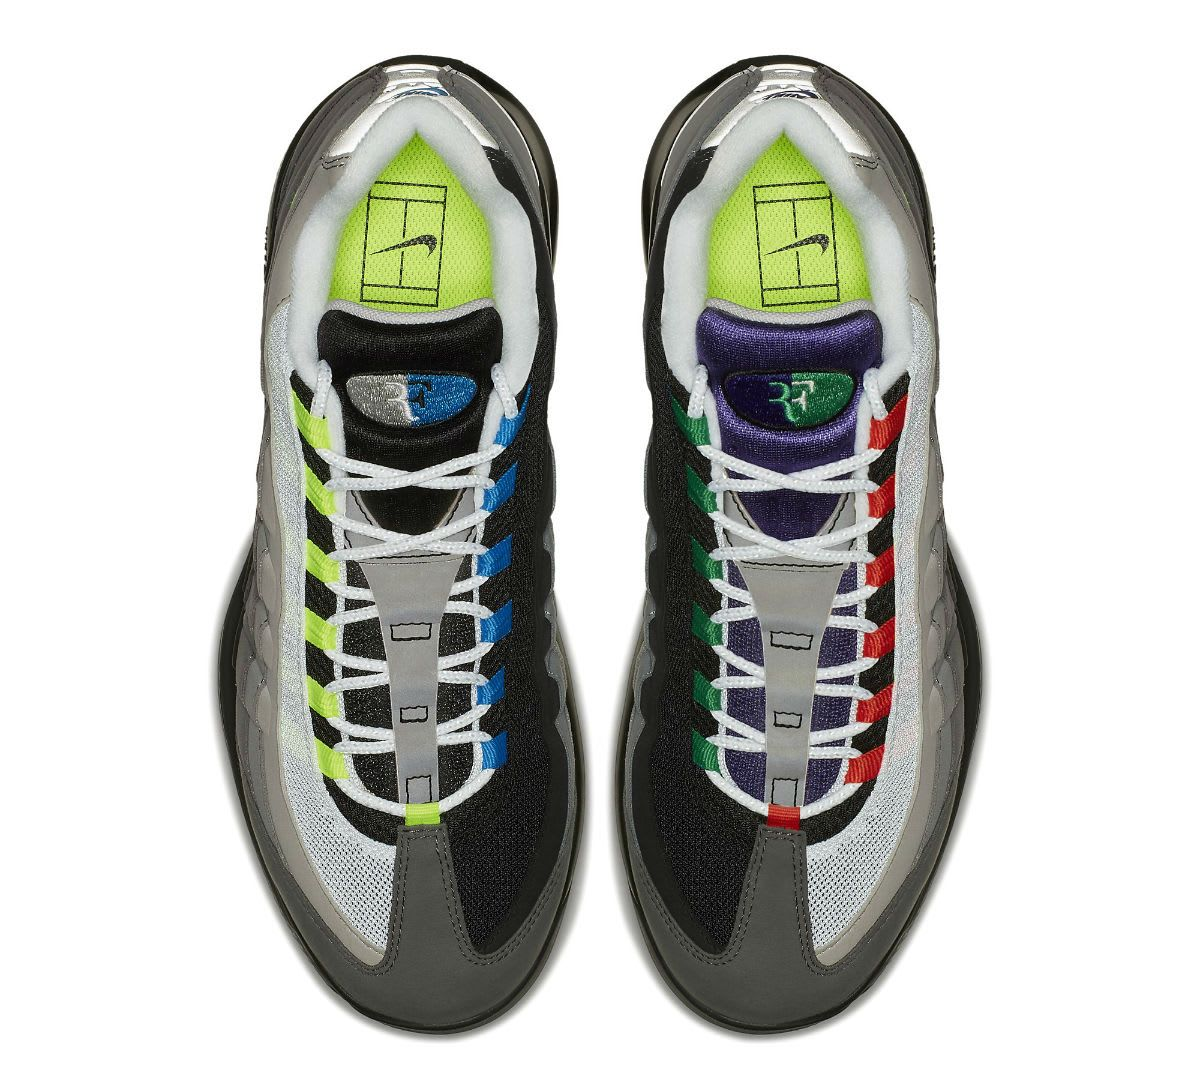 NikeCourt Vapor RF X Air Max 95 Greedy Release Date AO8759-077 Top